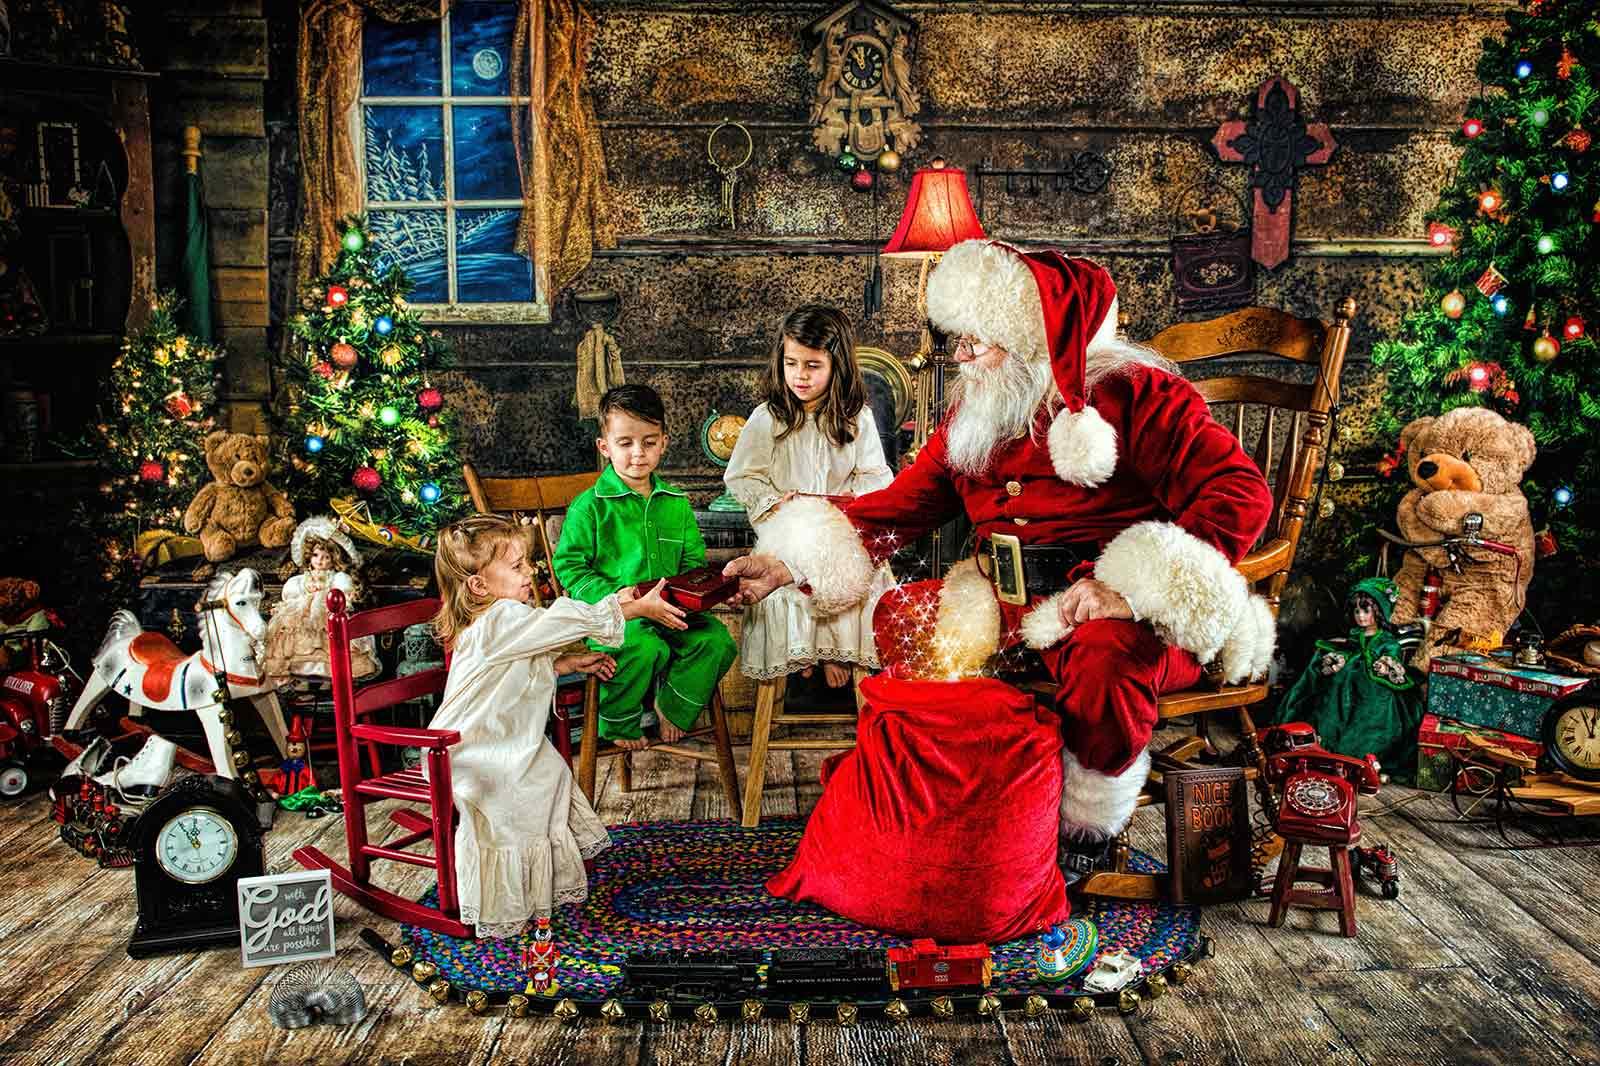 021_Magic-of-Santa-Anna-Thielen-Photography